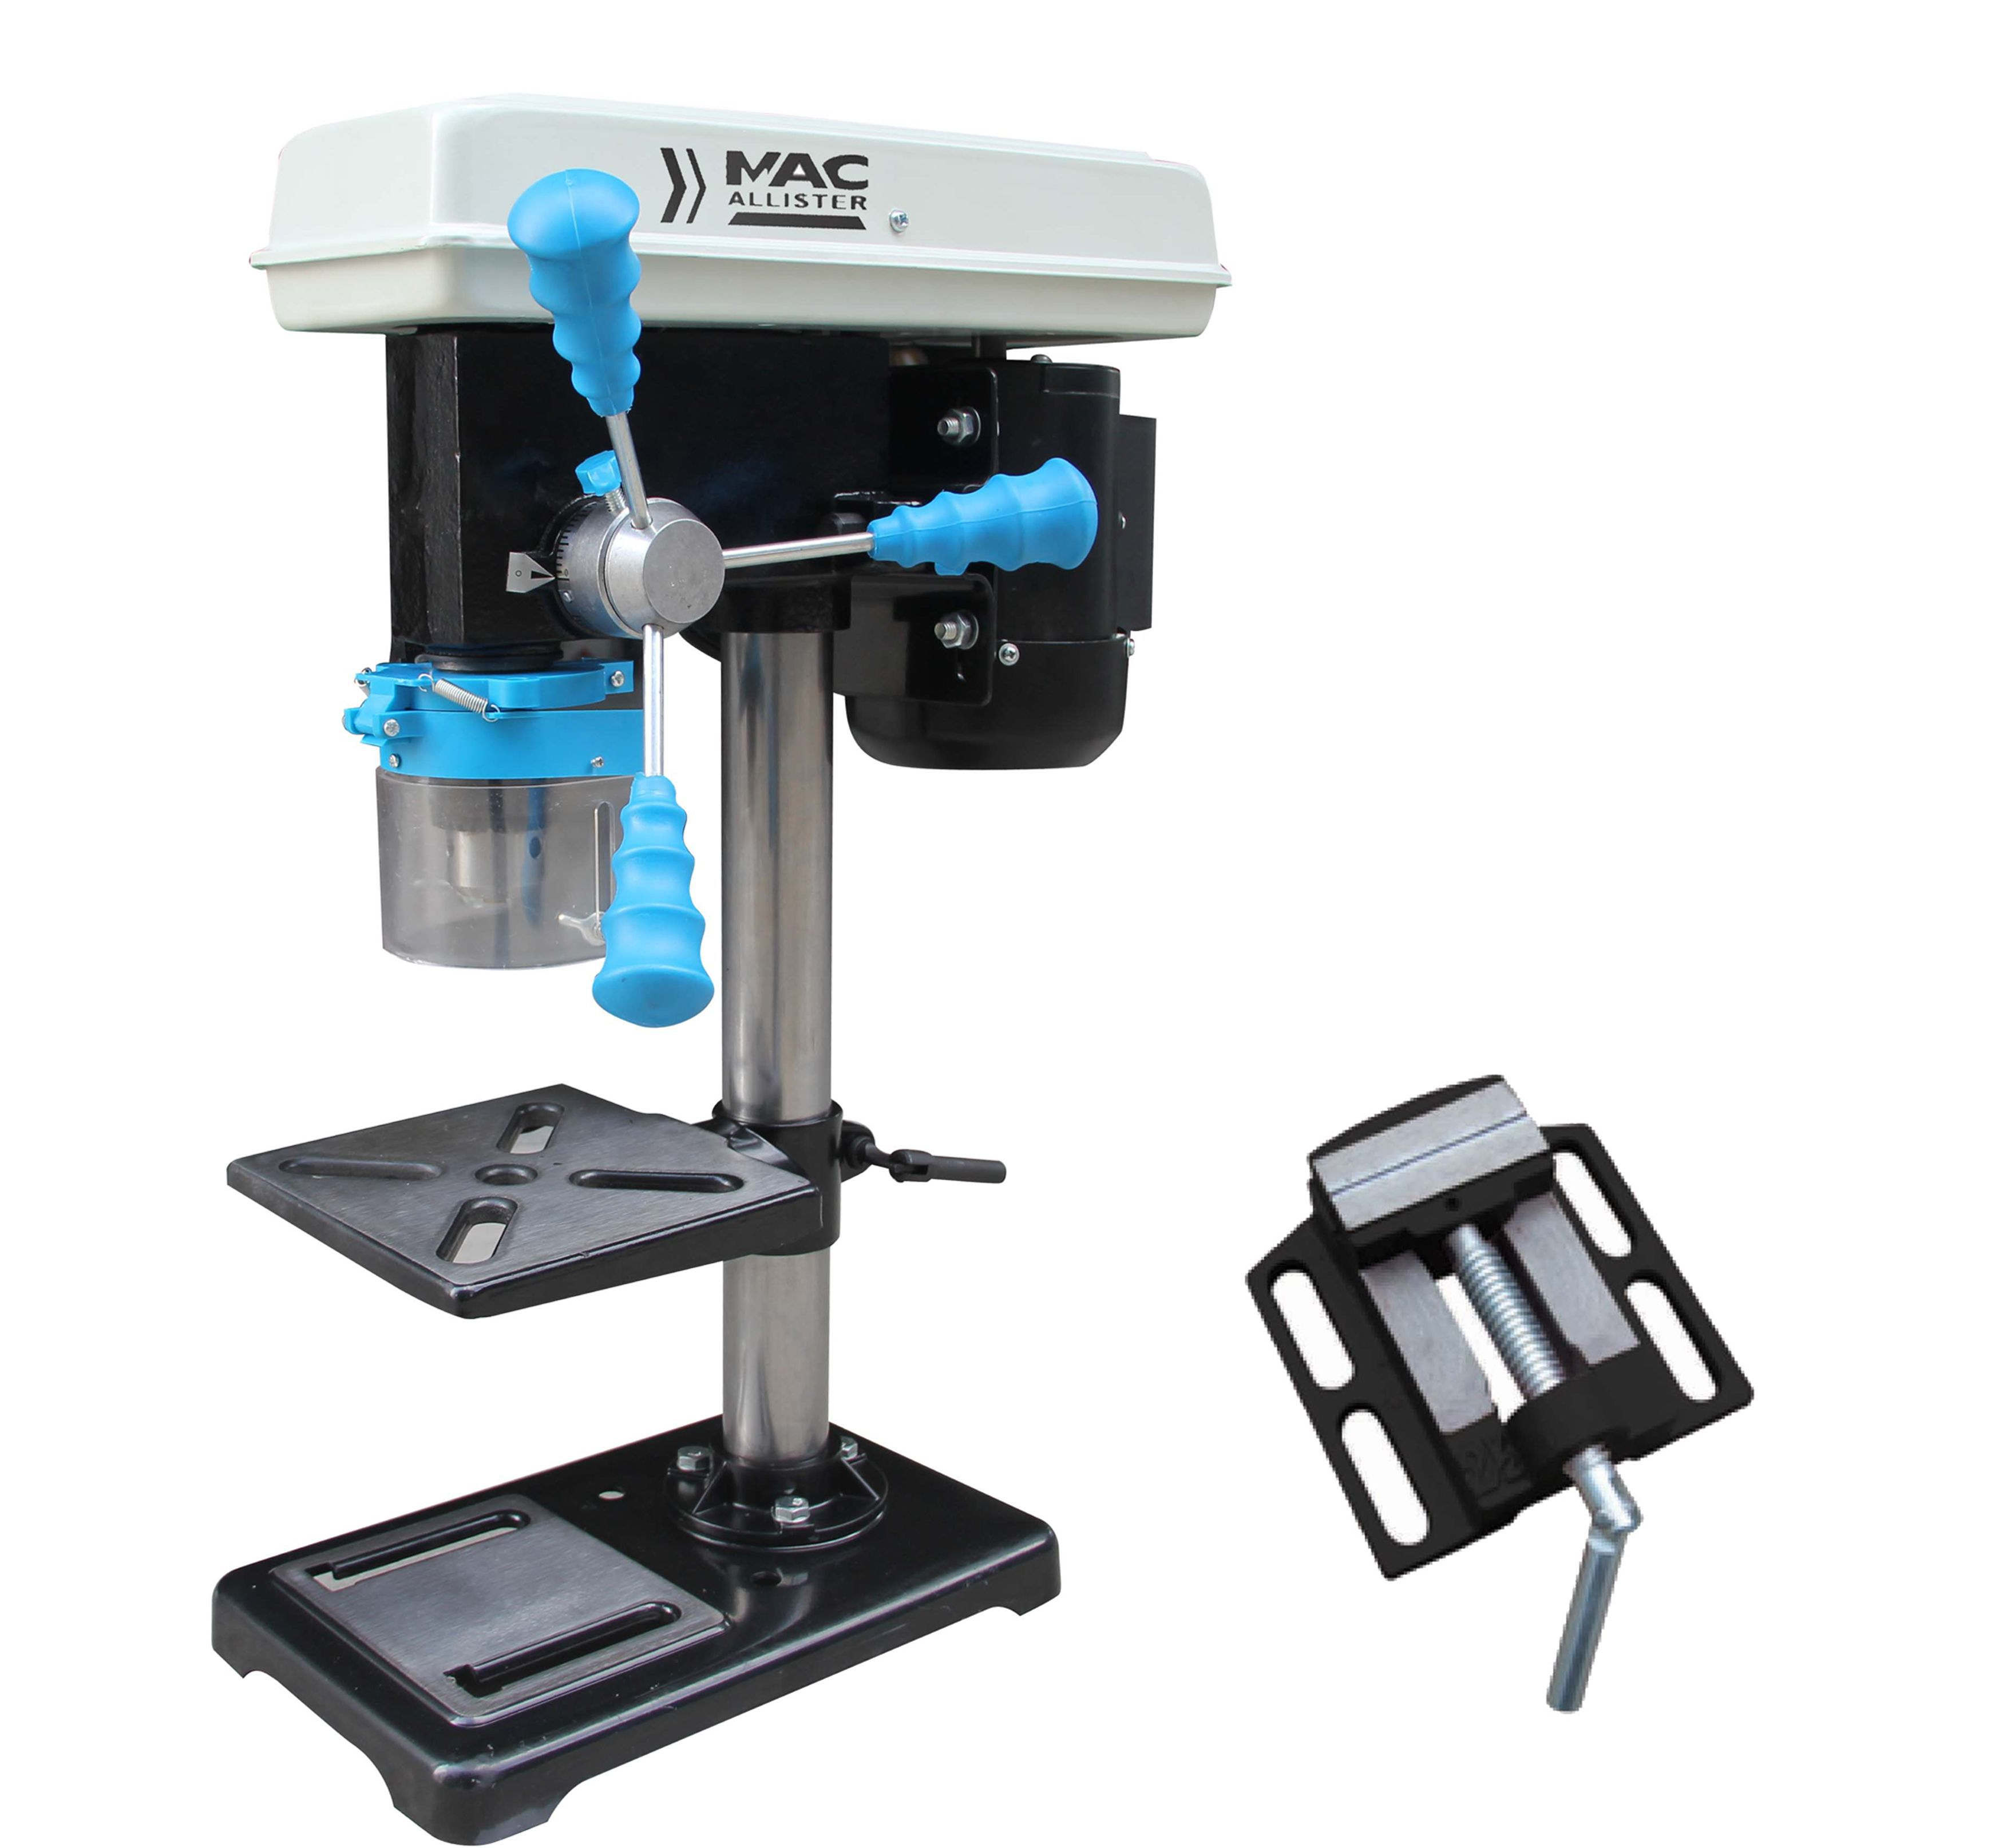 mac allister 500w 240v corded pillar drill departments. Black Bedroom Furniture Sets. Home Design Ideas